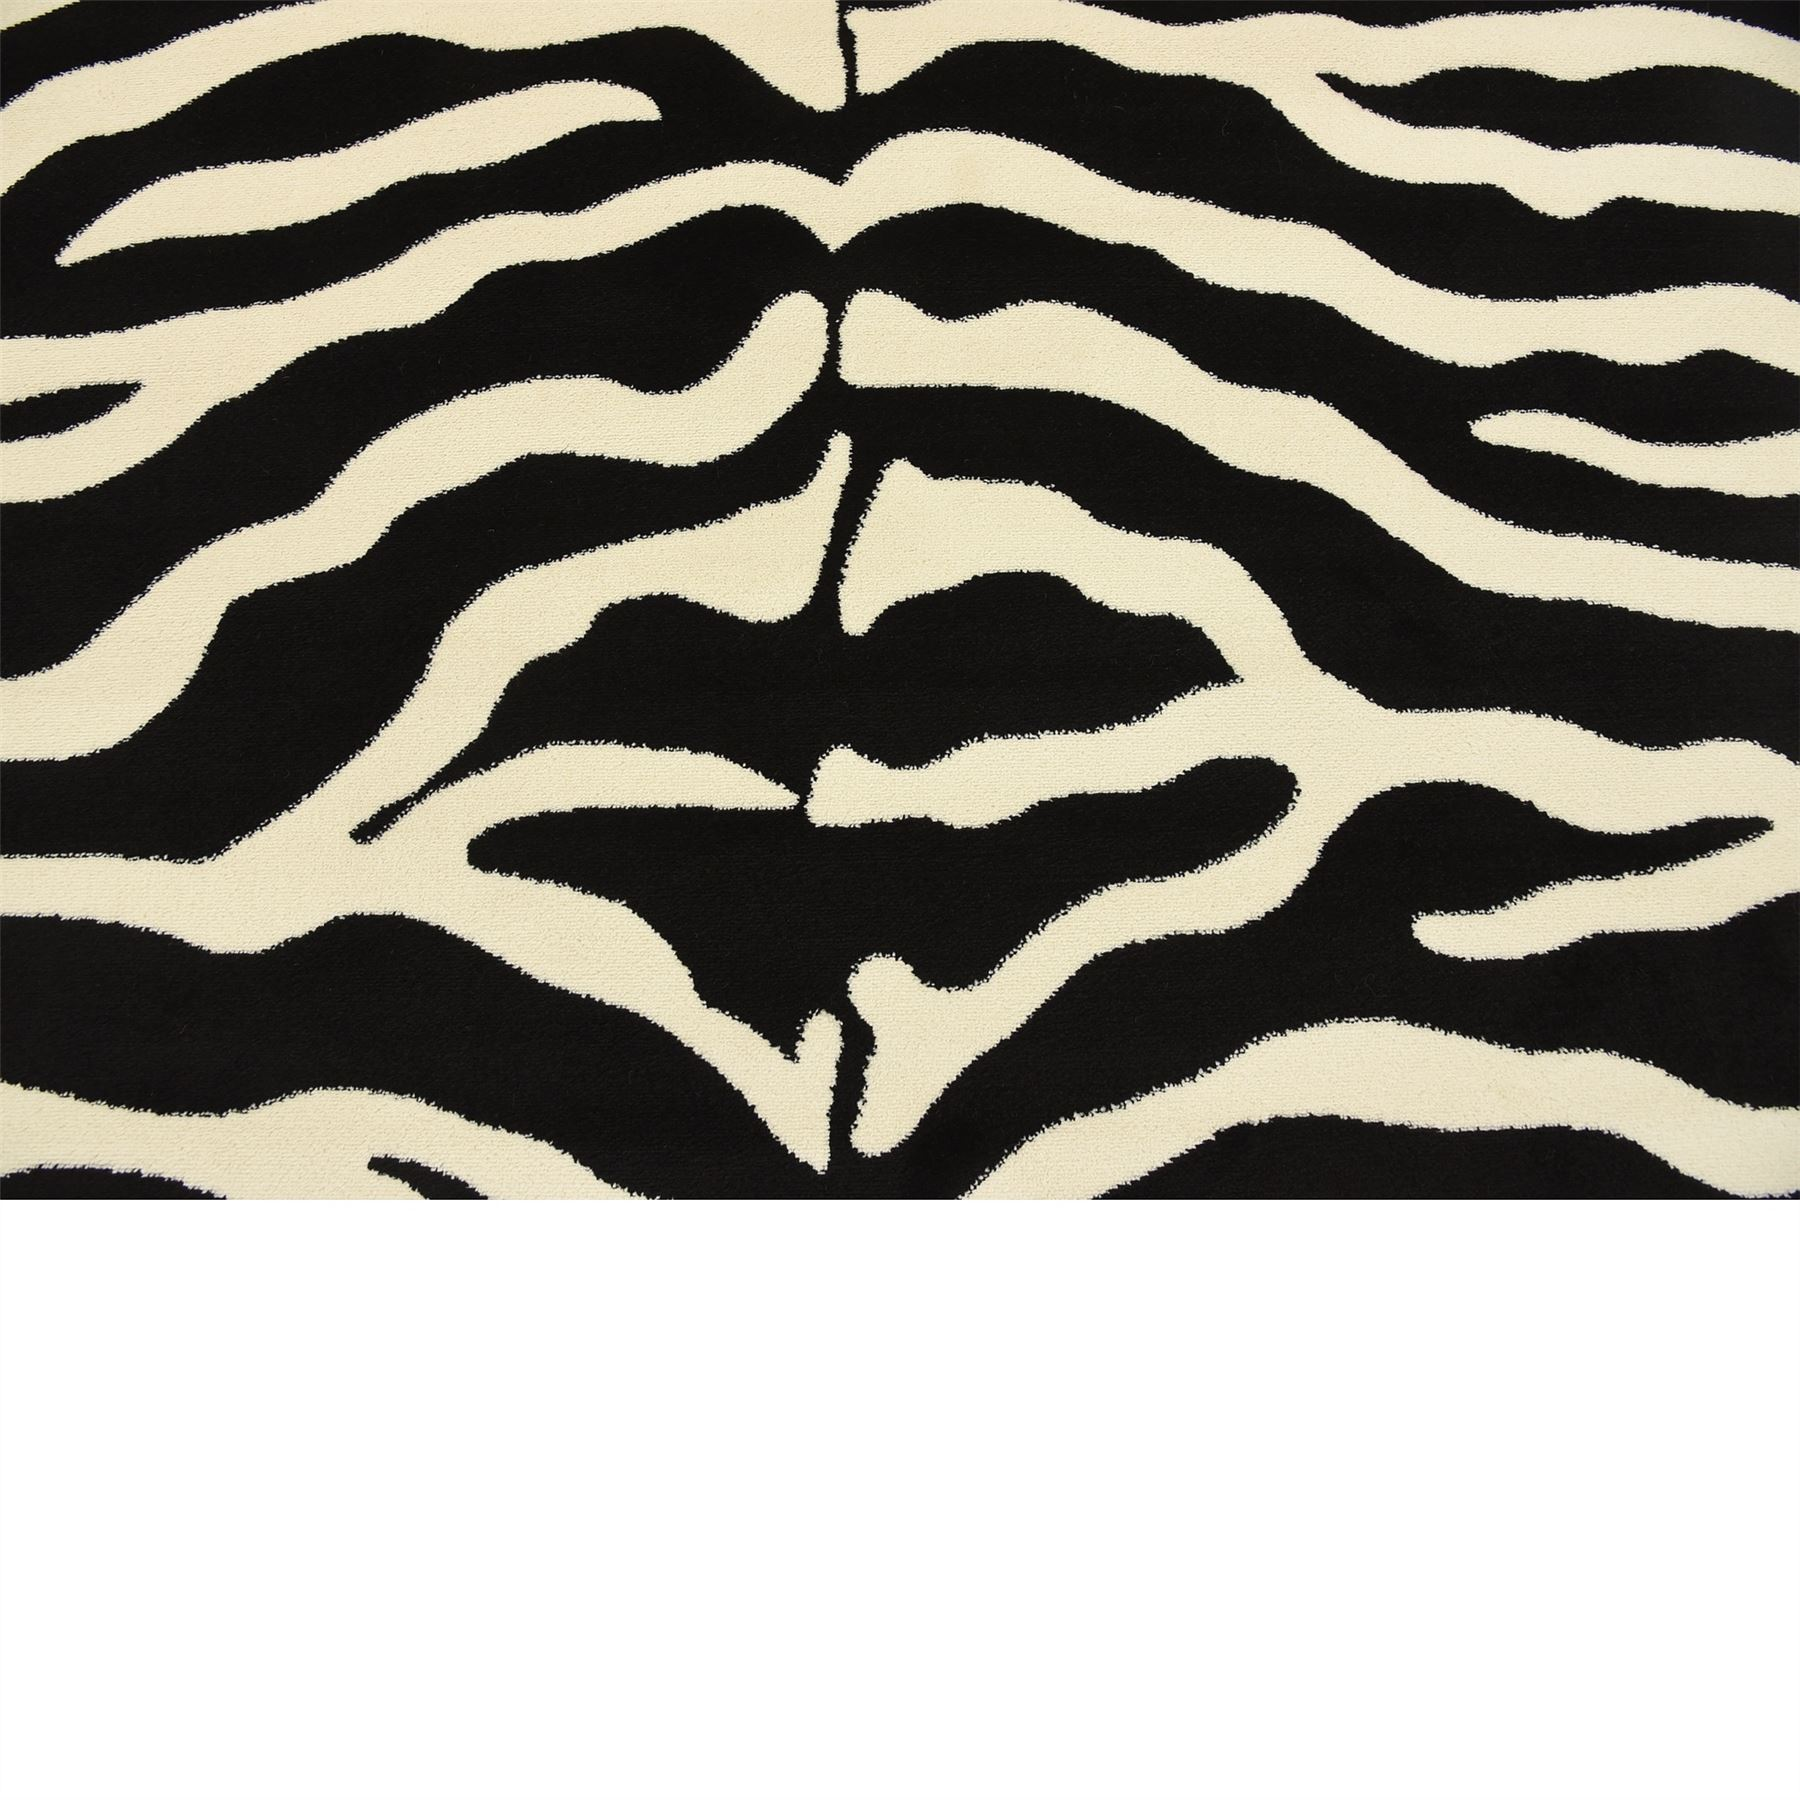 Acura Rugs Animal Hide White Black Zebra Area Rug: Modern Zebra Design Black White Area Rug Animal Pattern